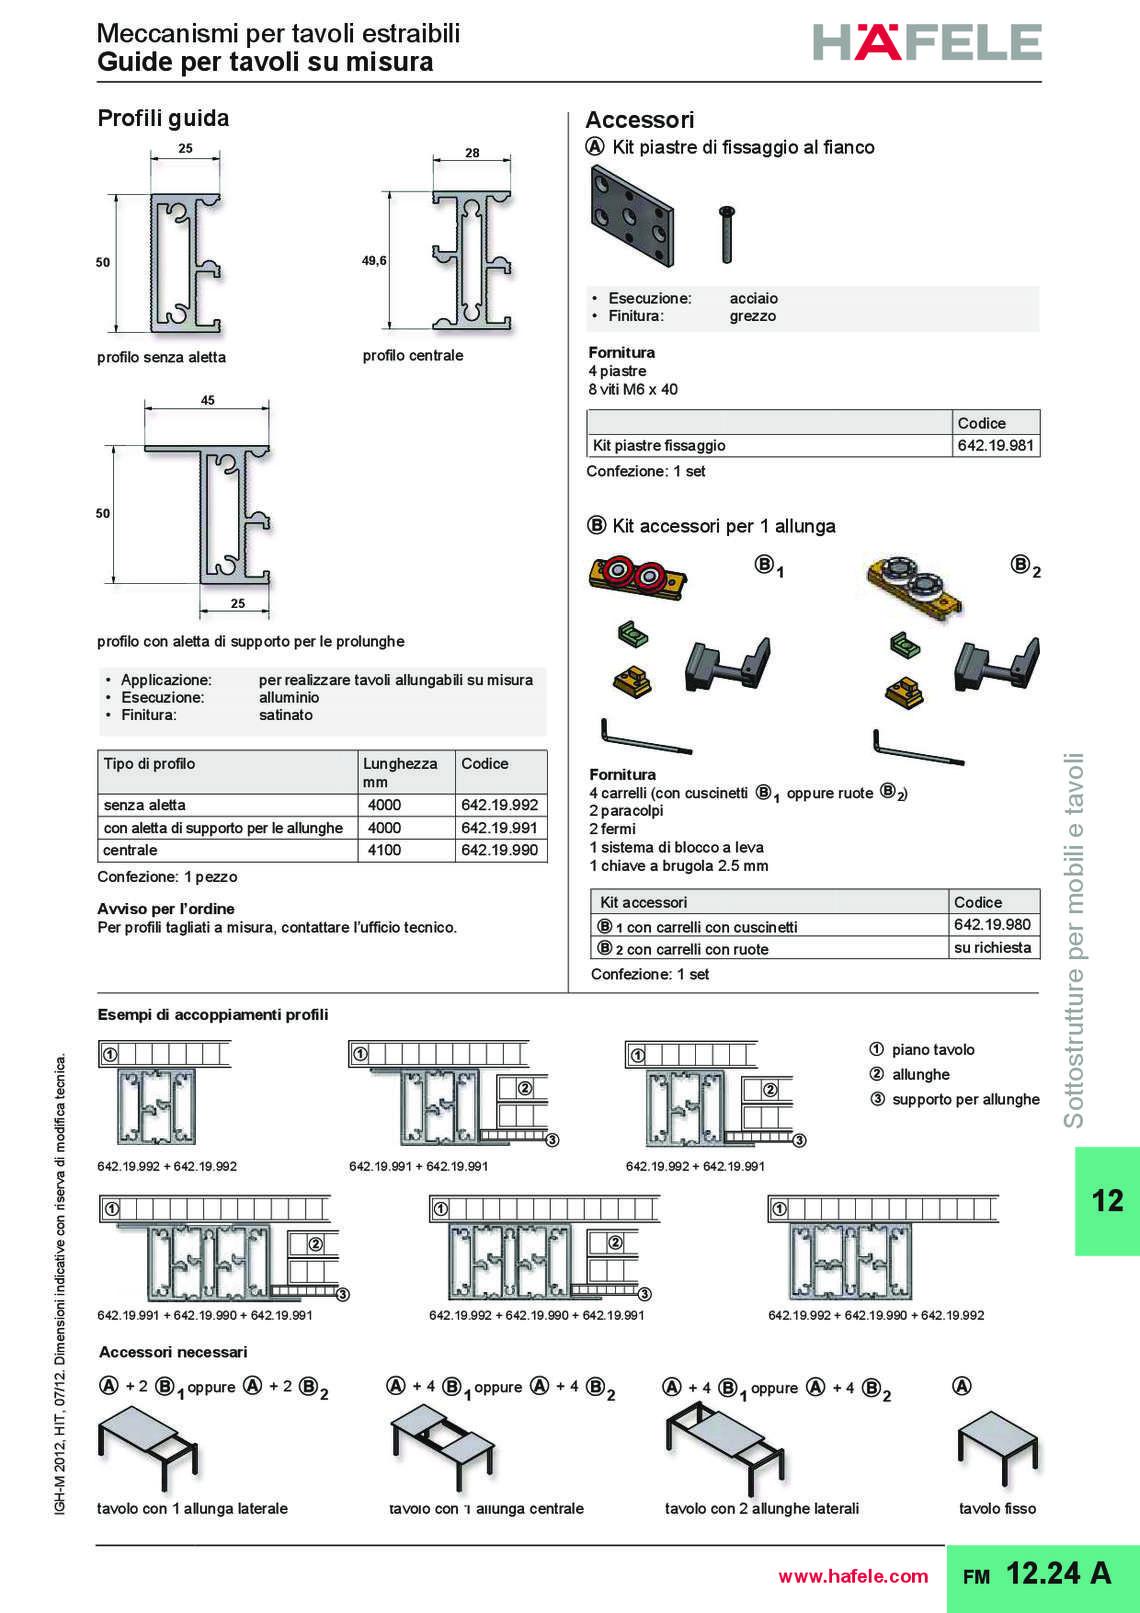 hafele-sottostrutture-per-mobili_83_040.jpg